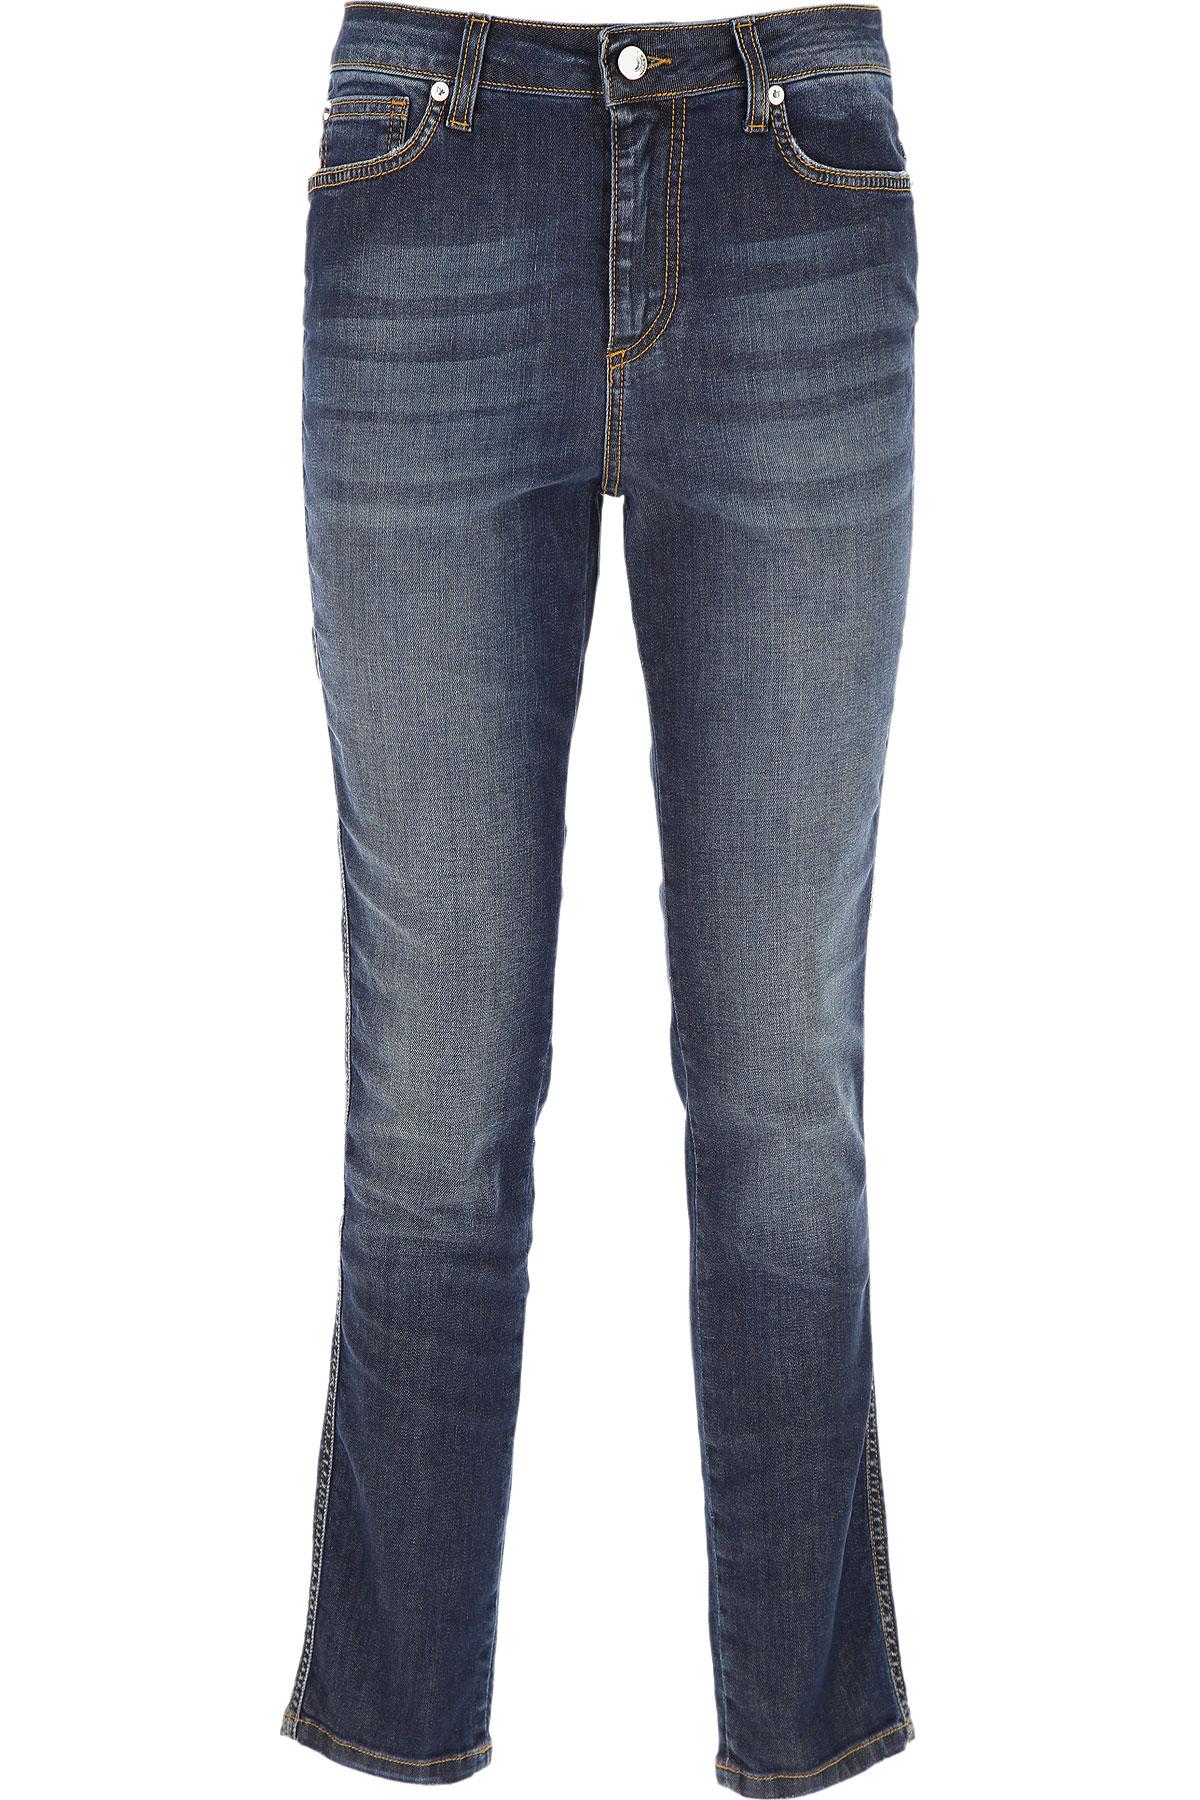 Ermanno Scervino Jeans On Sale, Denim Blue, Cotton, 2019, 10 4 6 8